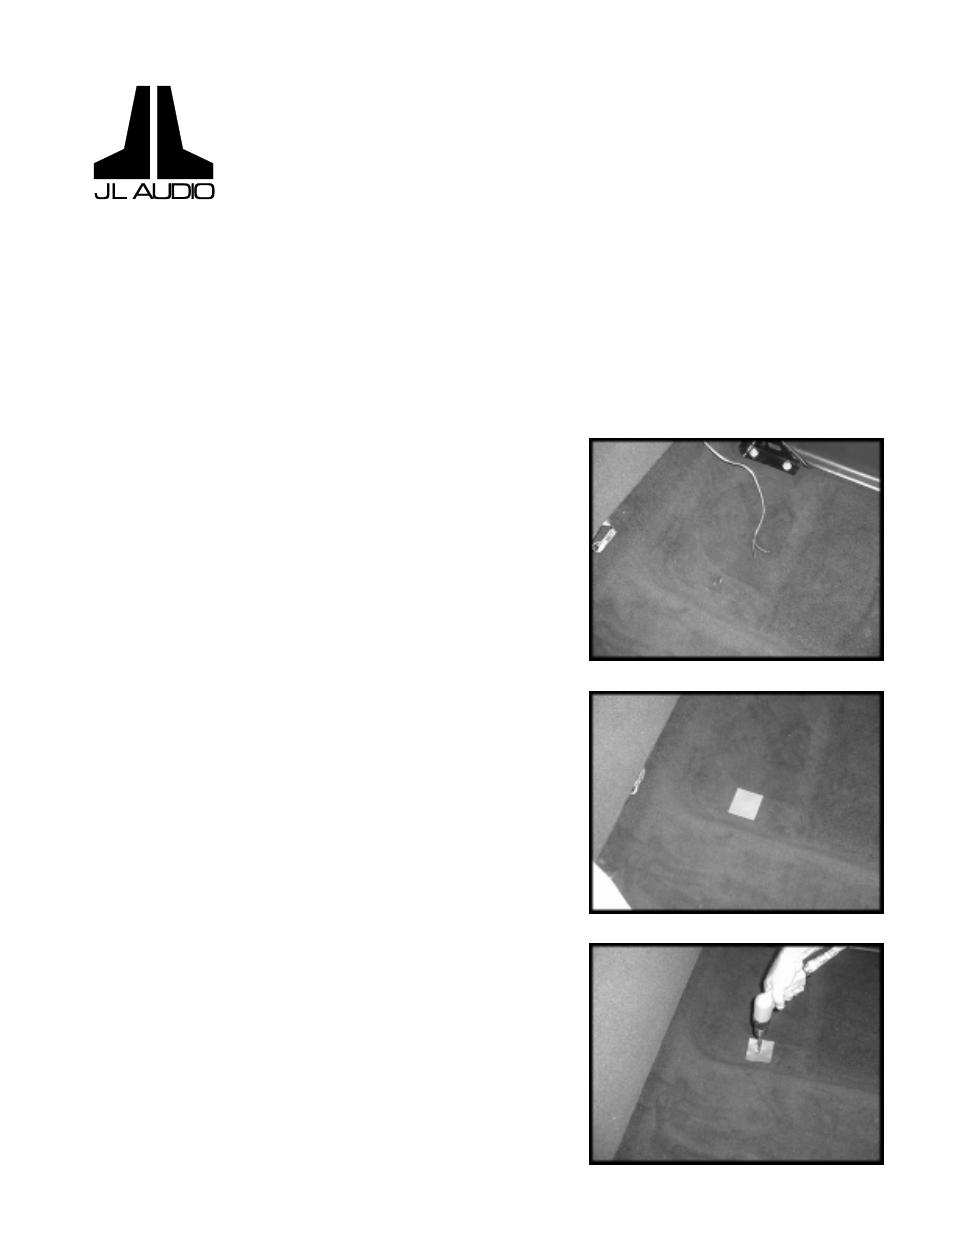 gm collision manuals